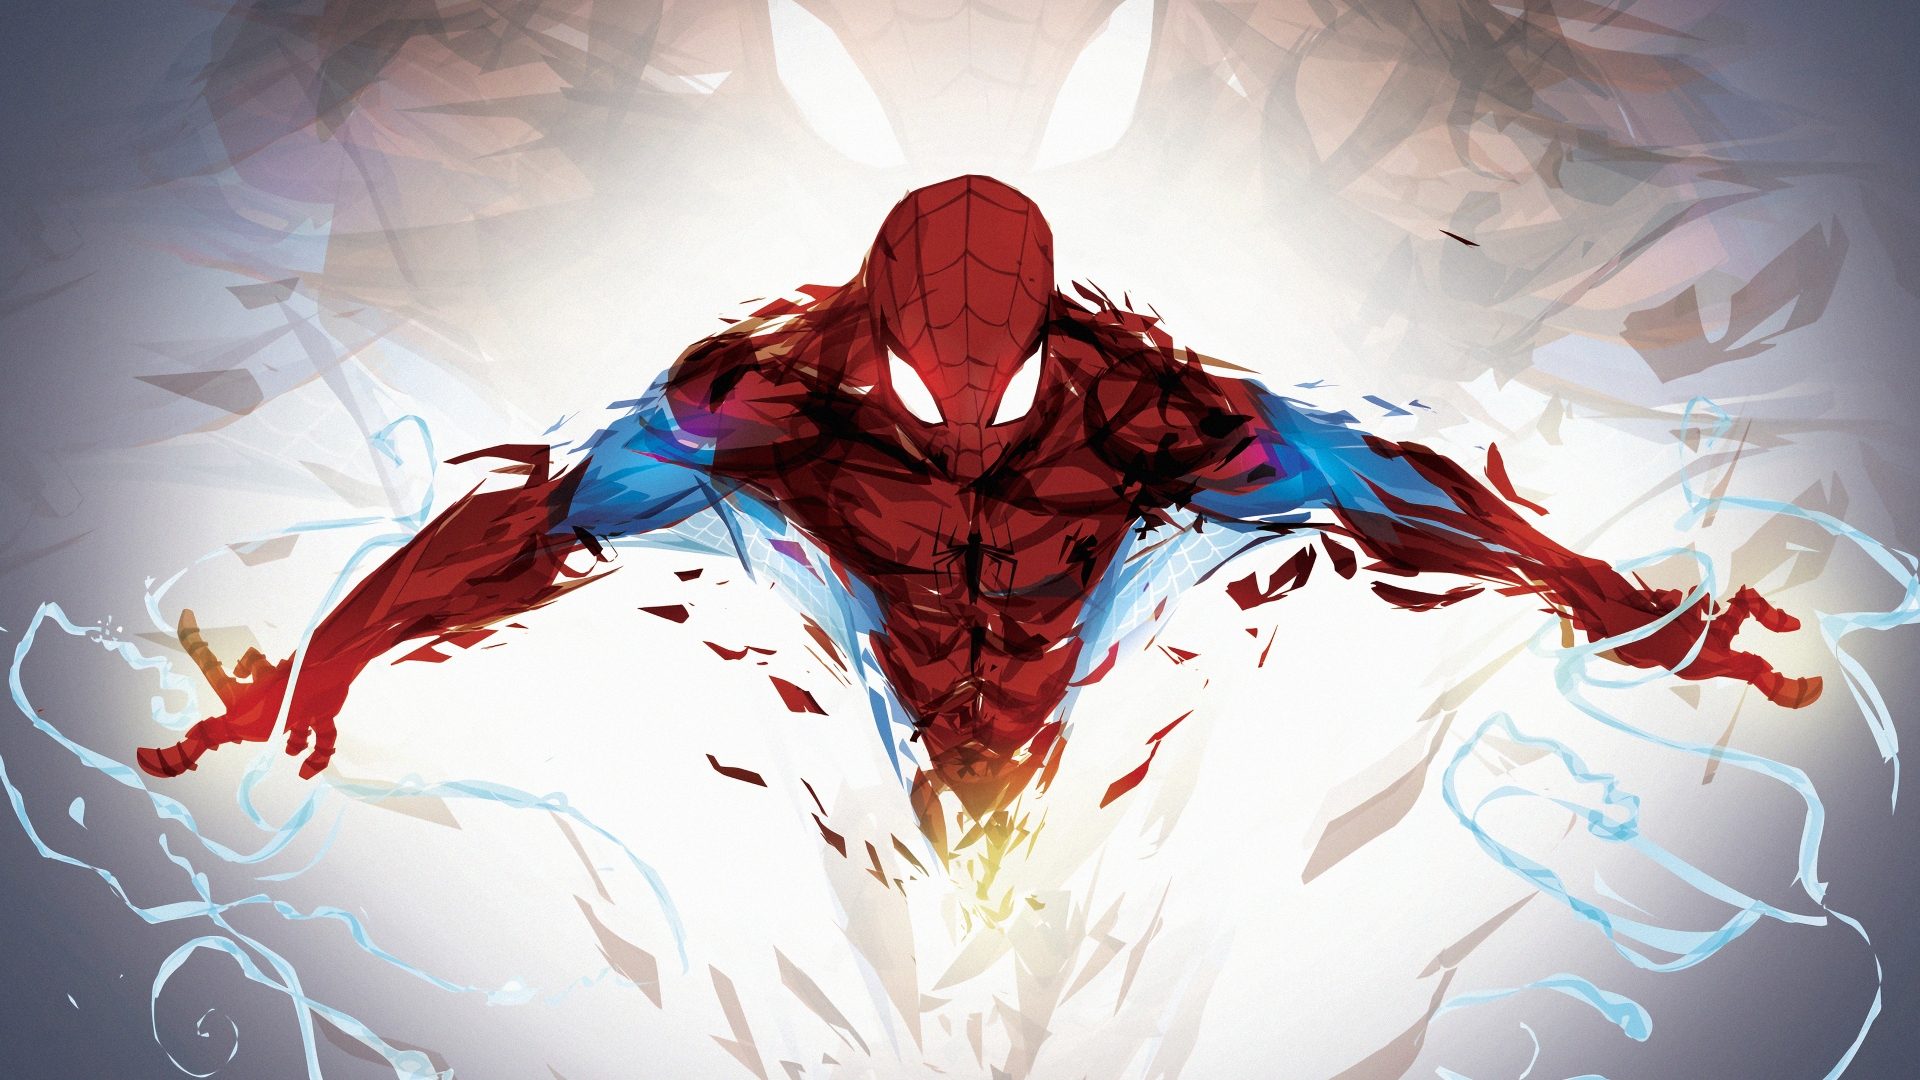 Spiderman In The Air Fanart Wallpaper 4k Ultra Hd Id3864